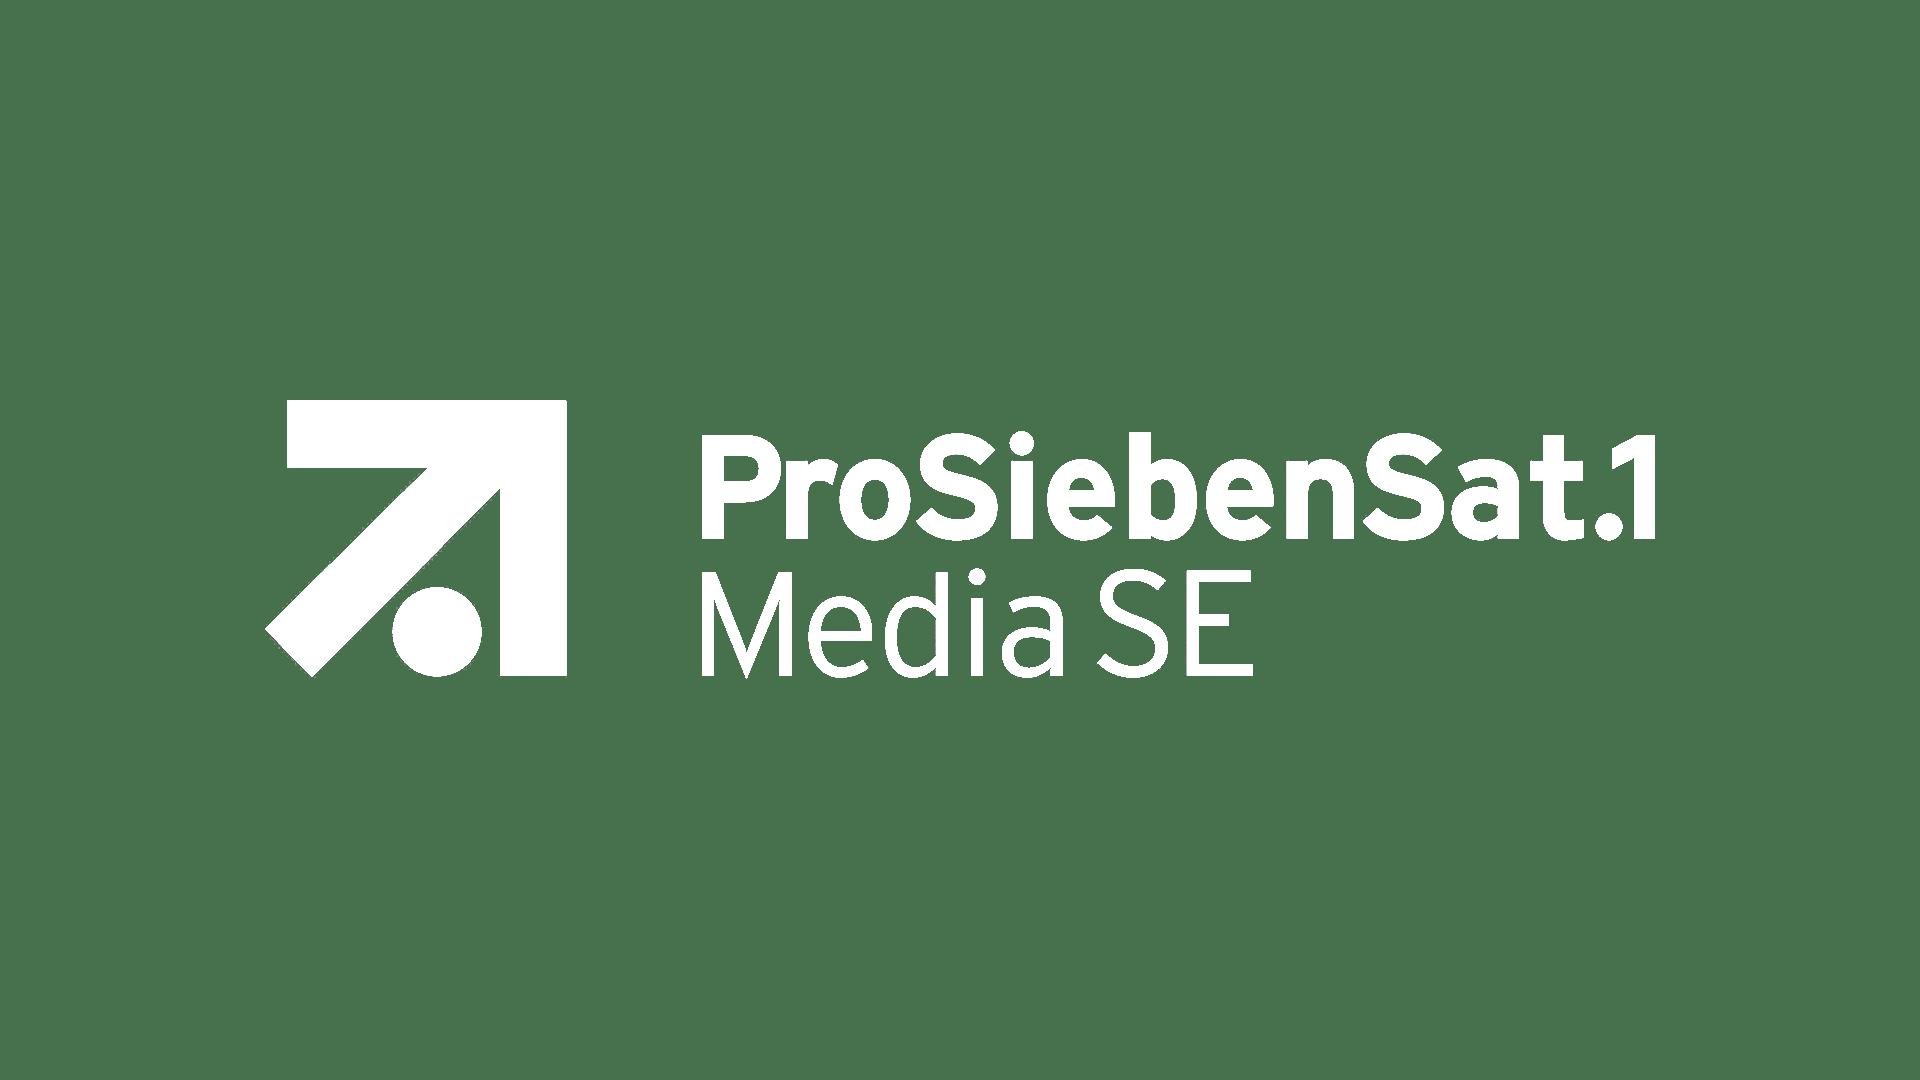 Prosieben logo white 8dh4kl.png?ixlib=rb 1.1